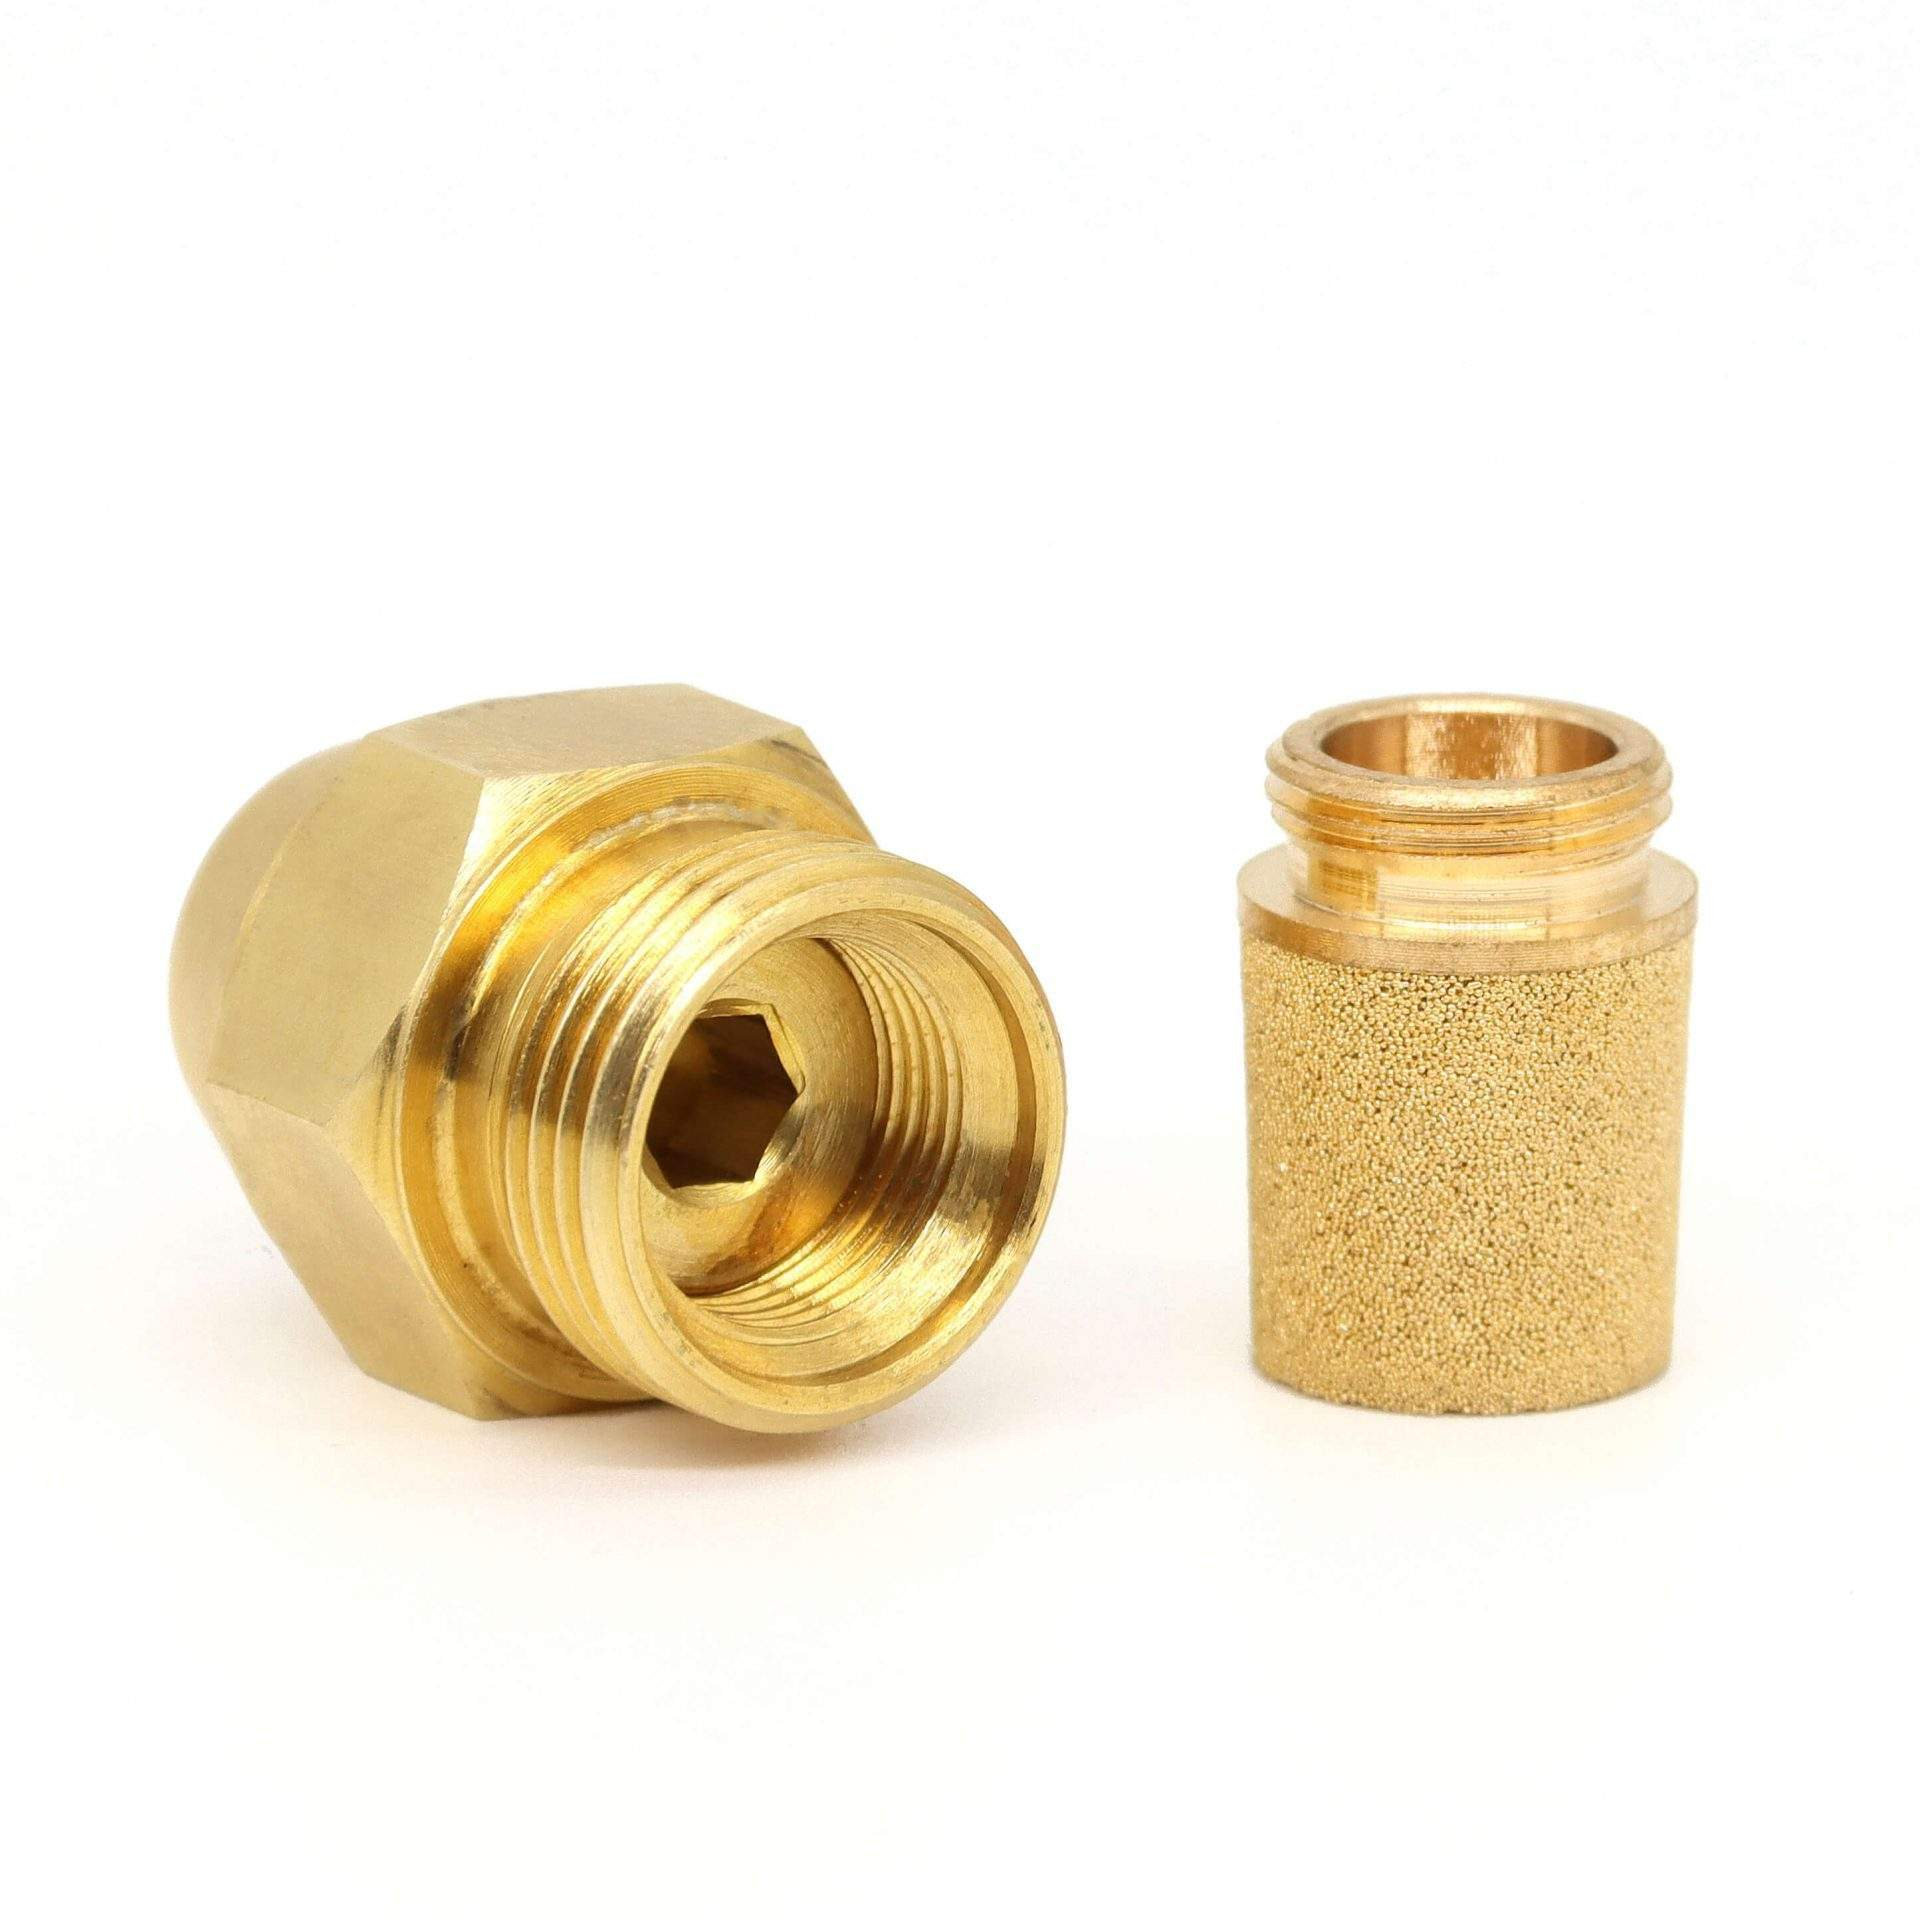 full cone oil burner nozzle